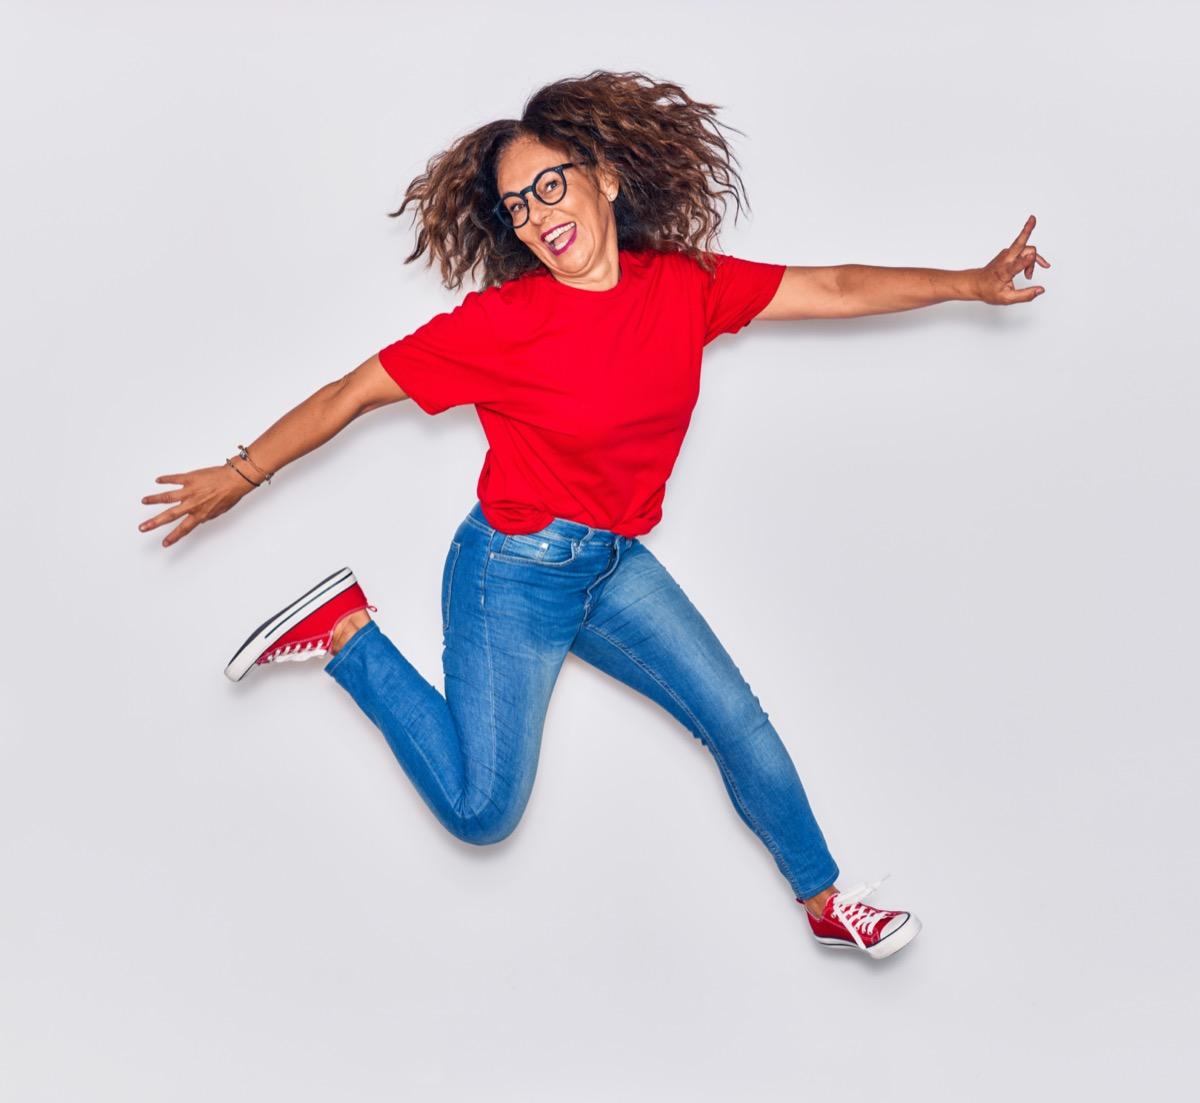 Senior woman jumping for joy